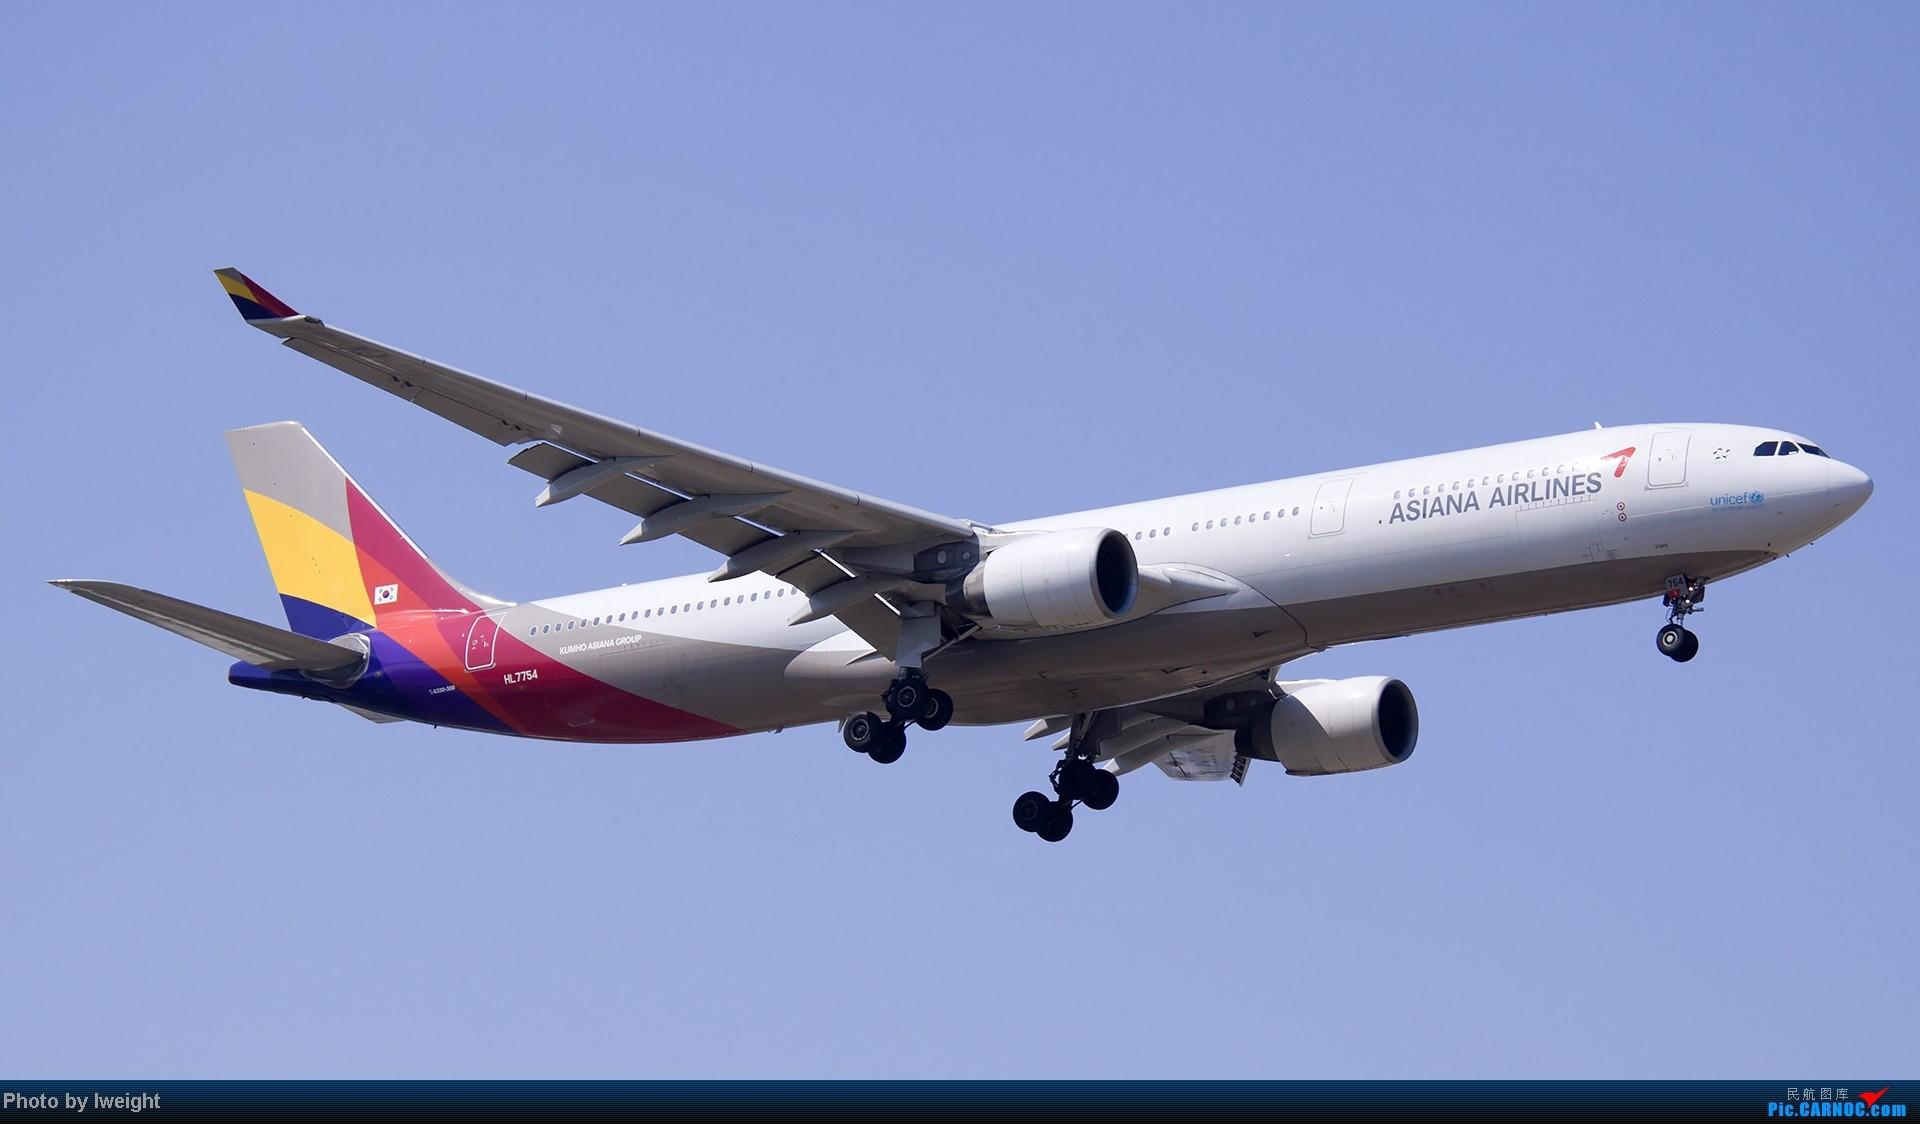 Re:[原创]北京难得的好天气,收获多种机型和彩绘,遗憾的是再次错过卡航巴塞罗那彩绘 AIRBUS A330-300 HL7754 中国北京首都机场